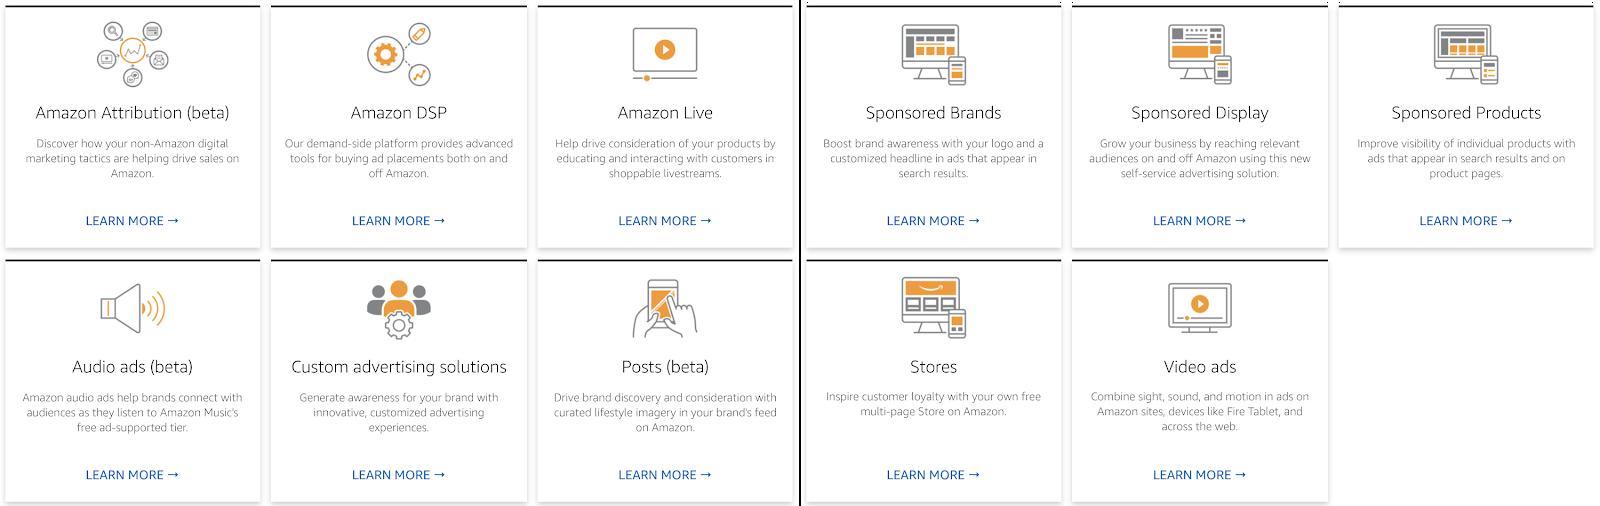 screen shot of Amazon advertising possibilities